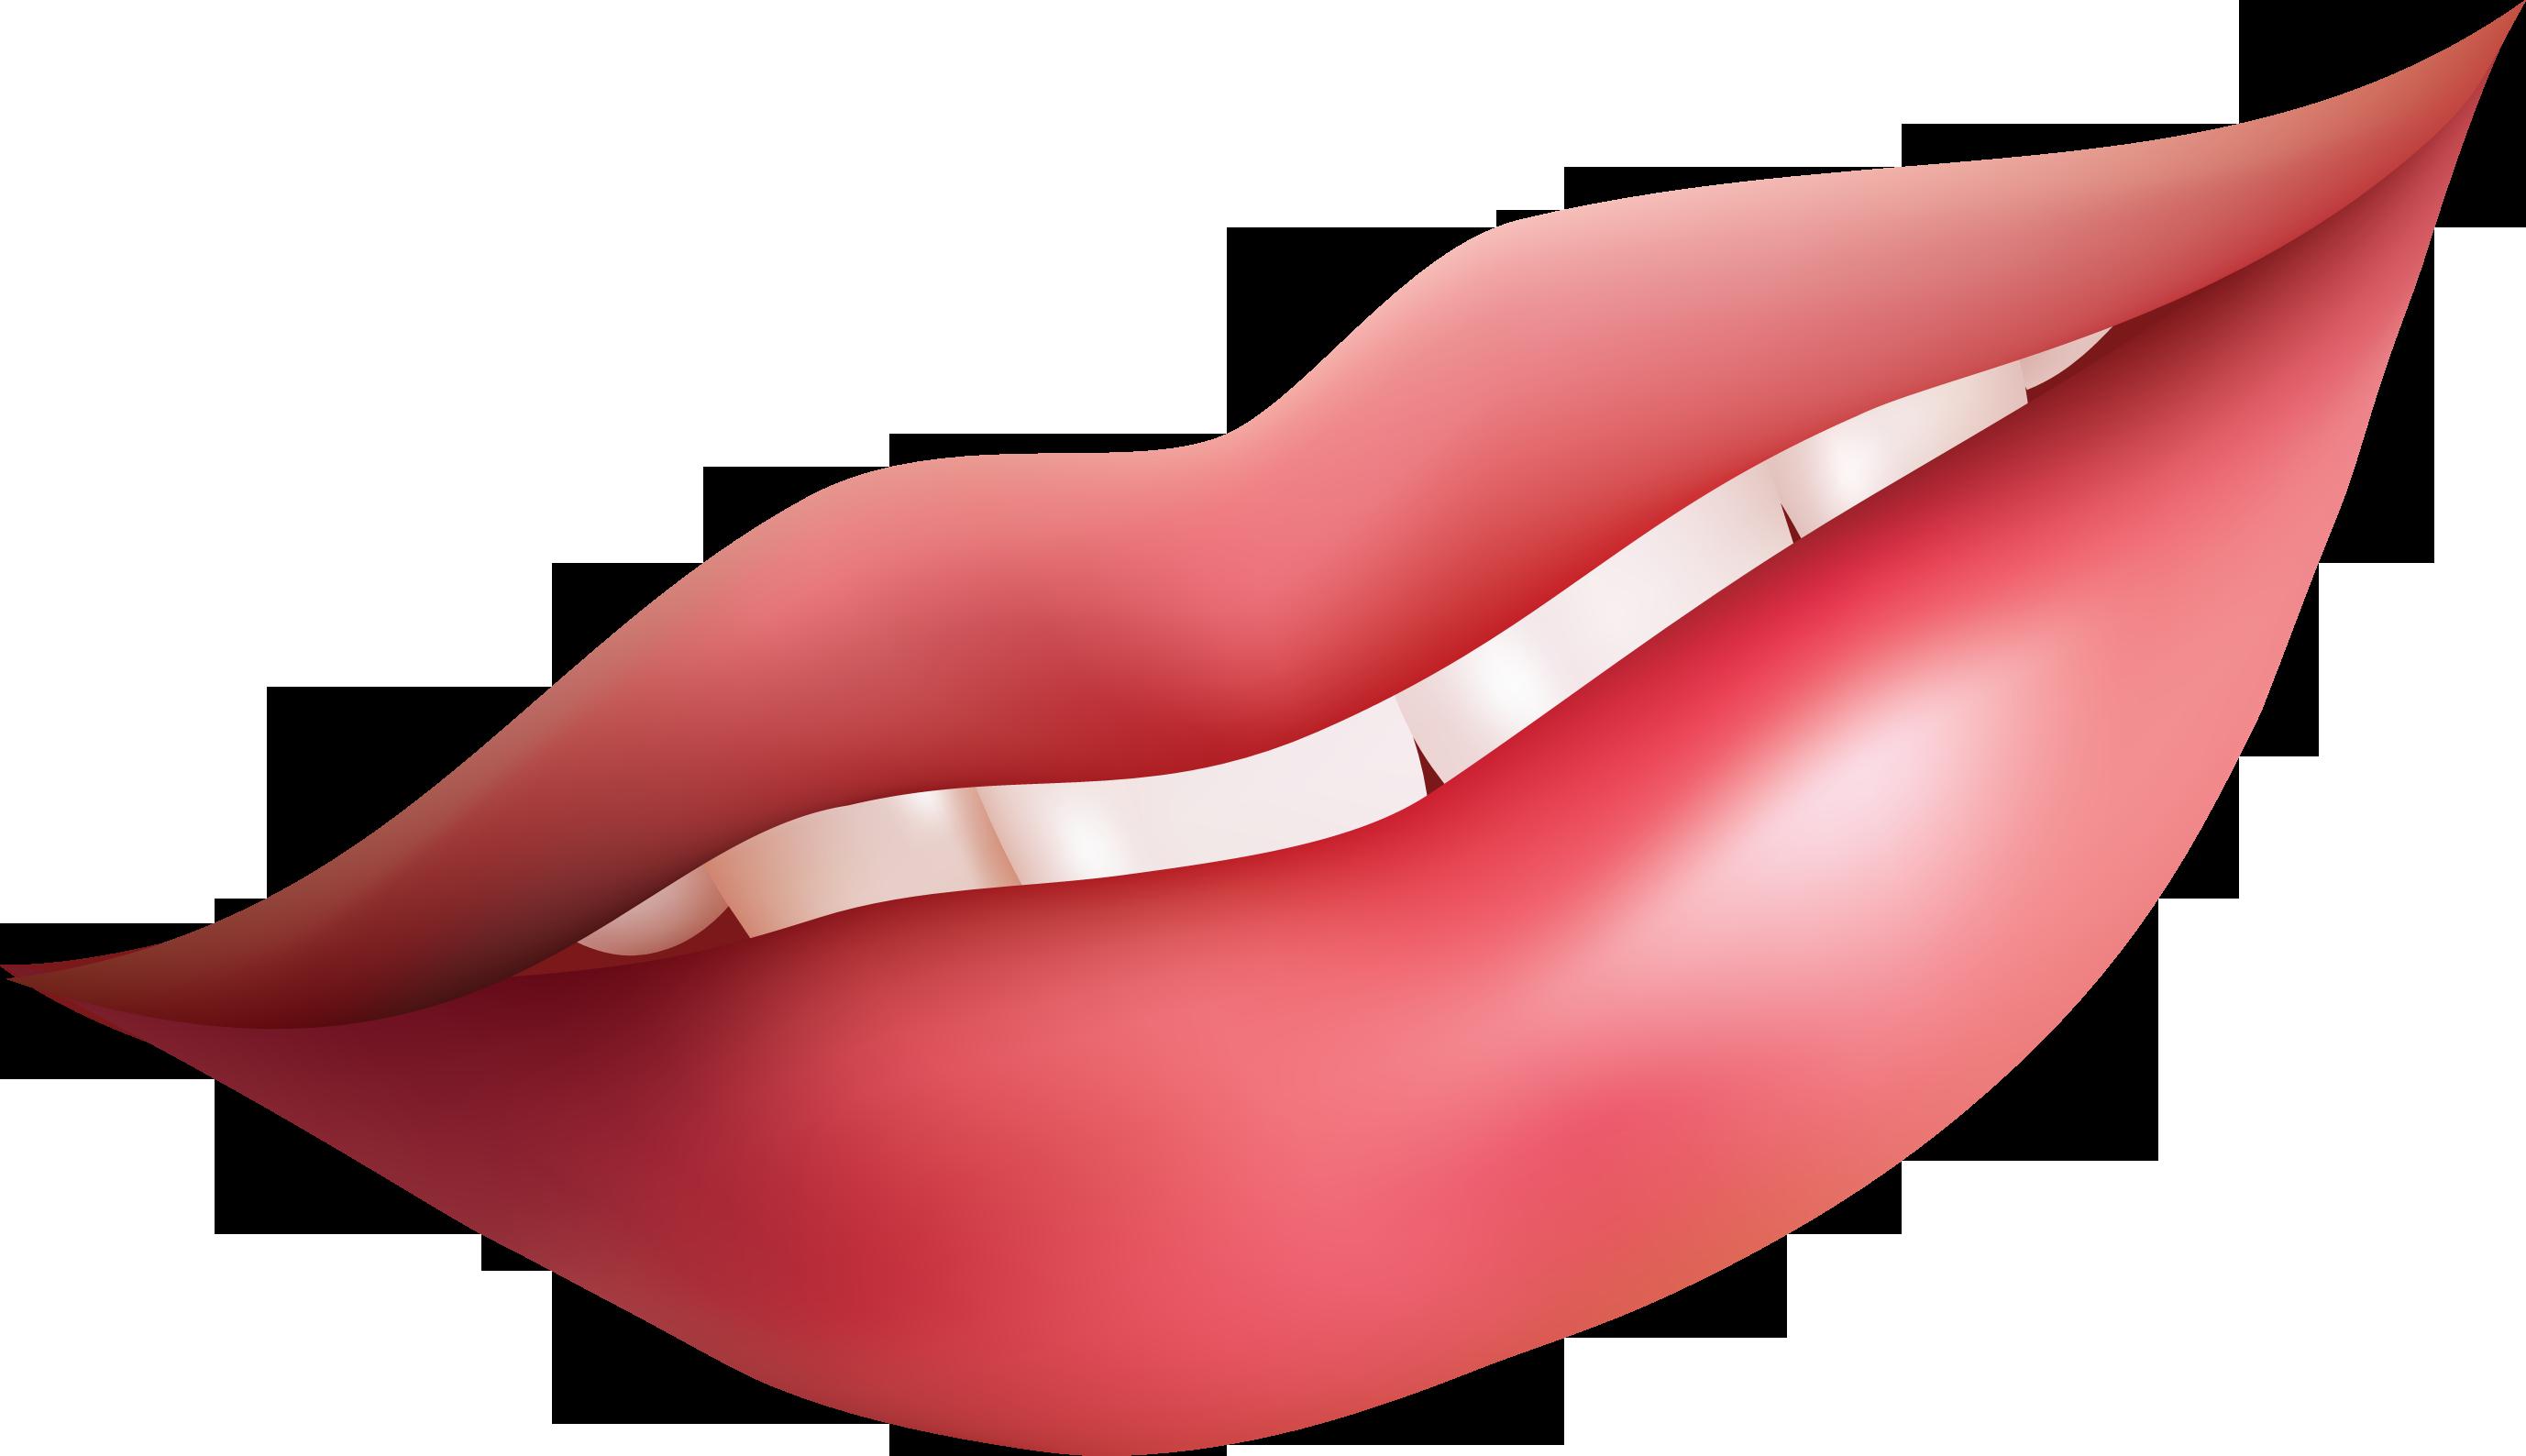 2755x1588 Free Lips Clip Art Clipart Image 3